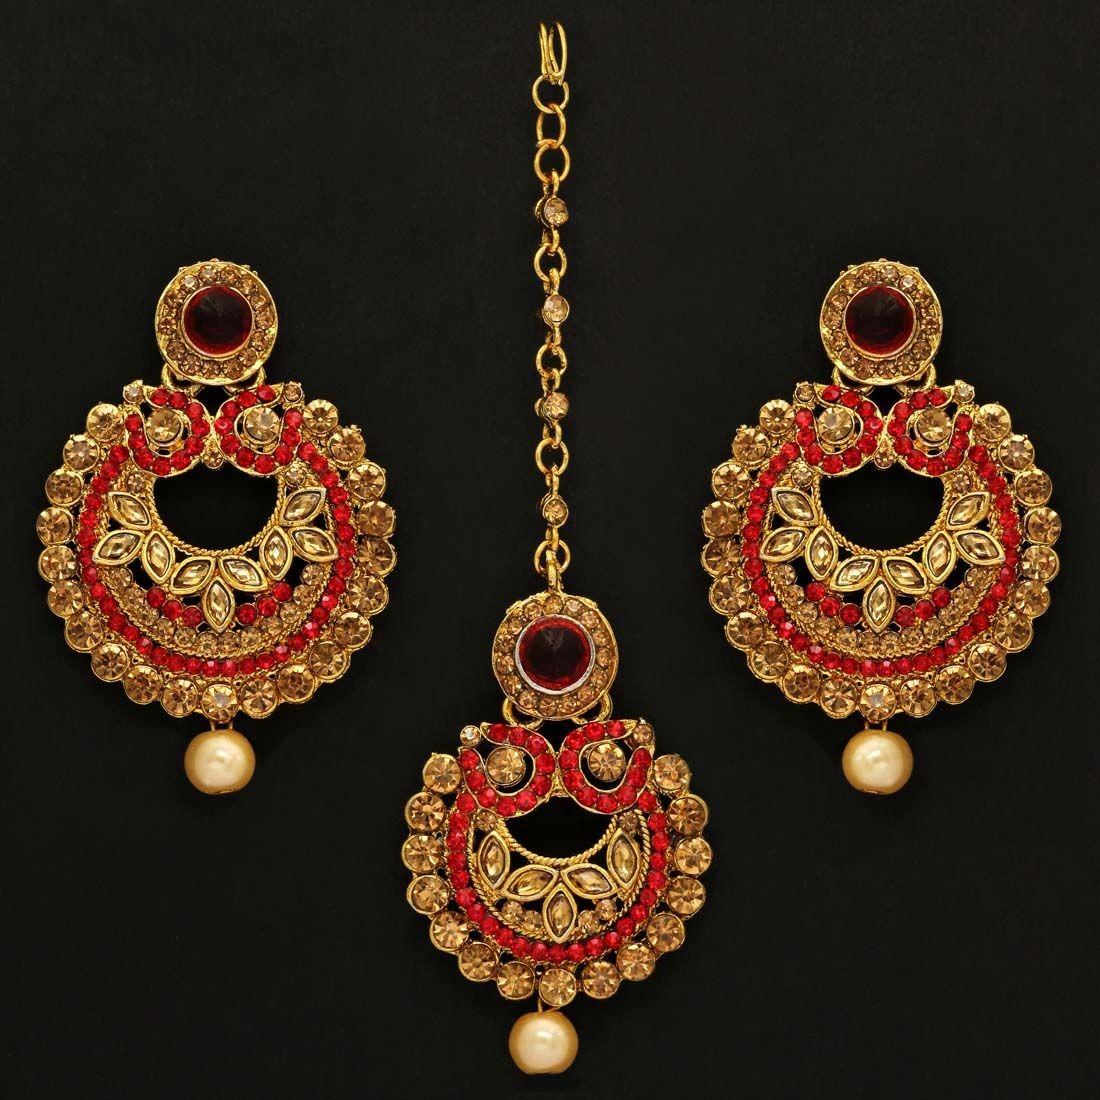 Conjunto joyas fiesta india